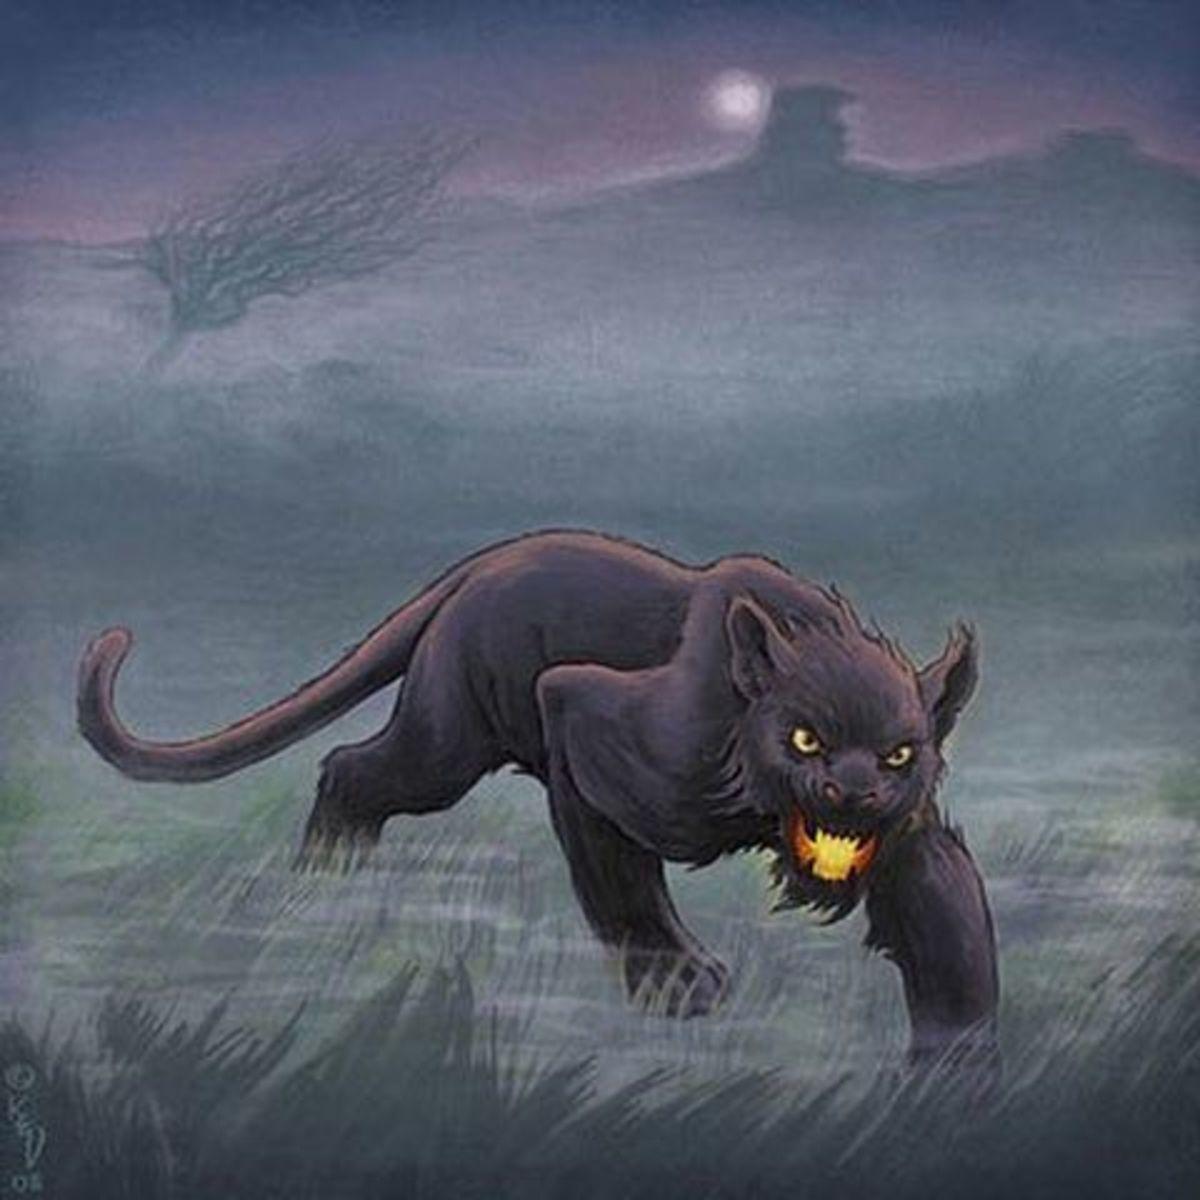 Artist's interpretation of the Beast of Bodmin Moor.